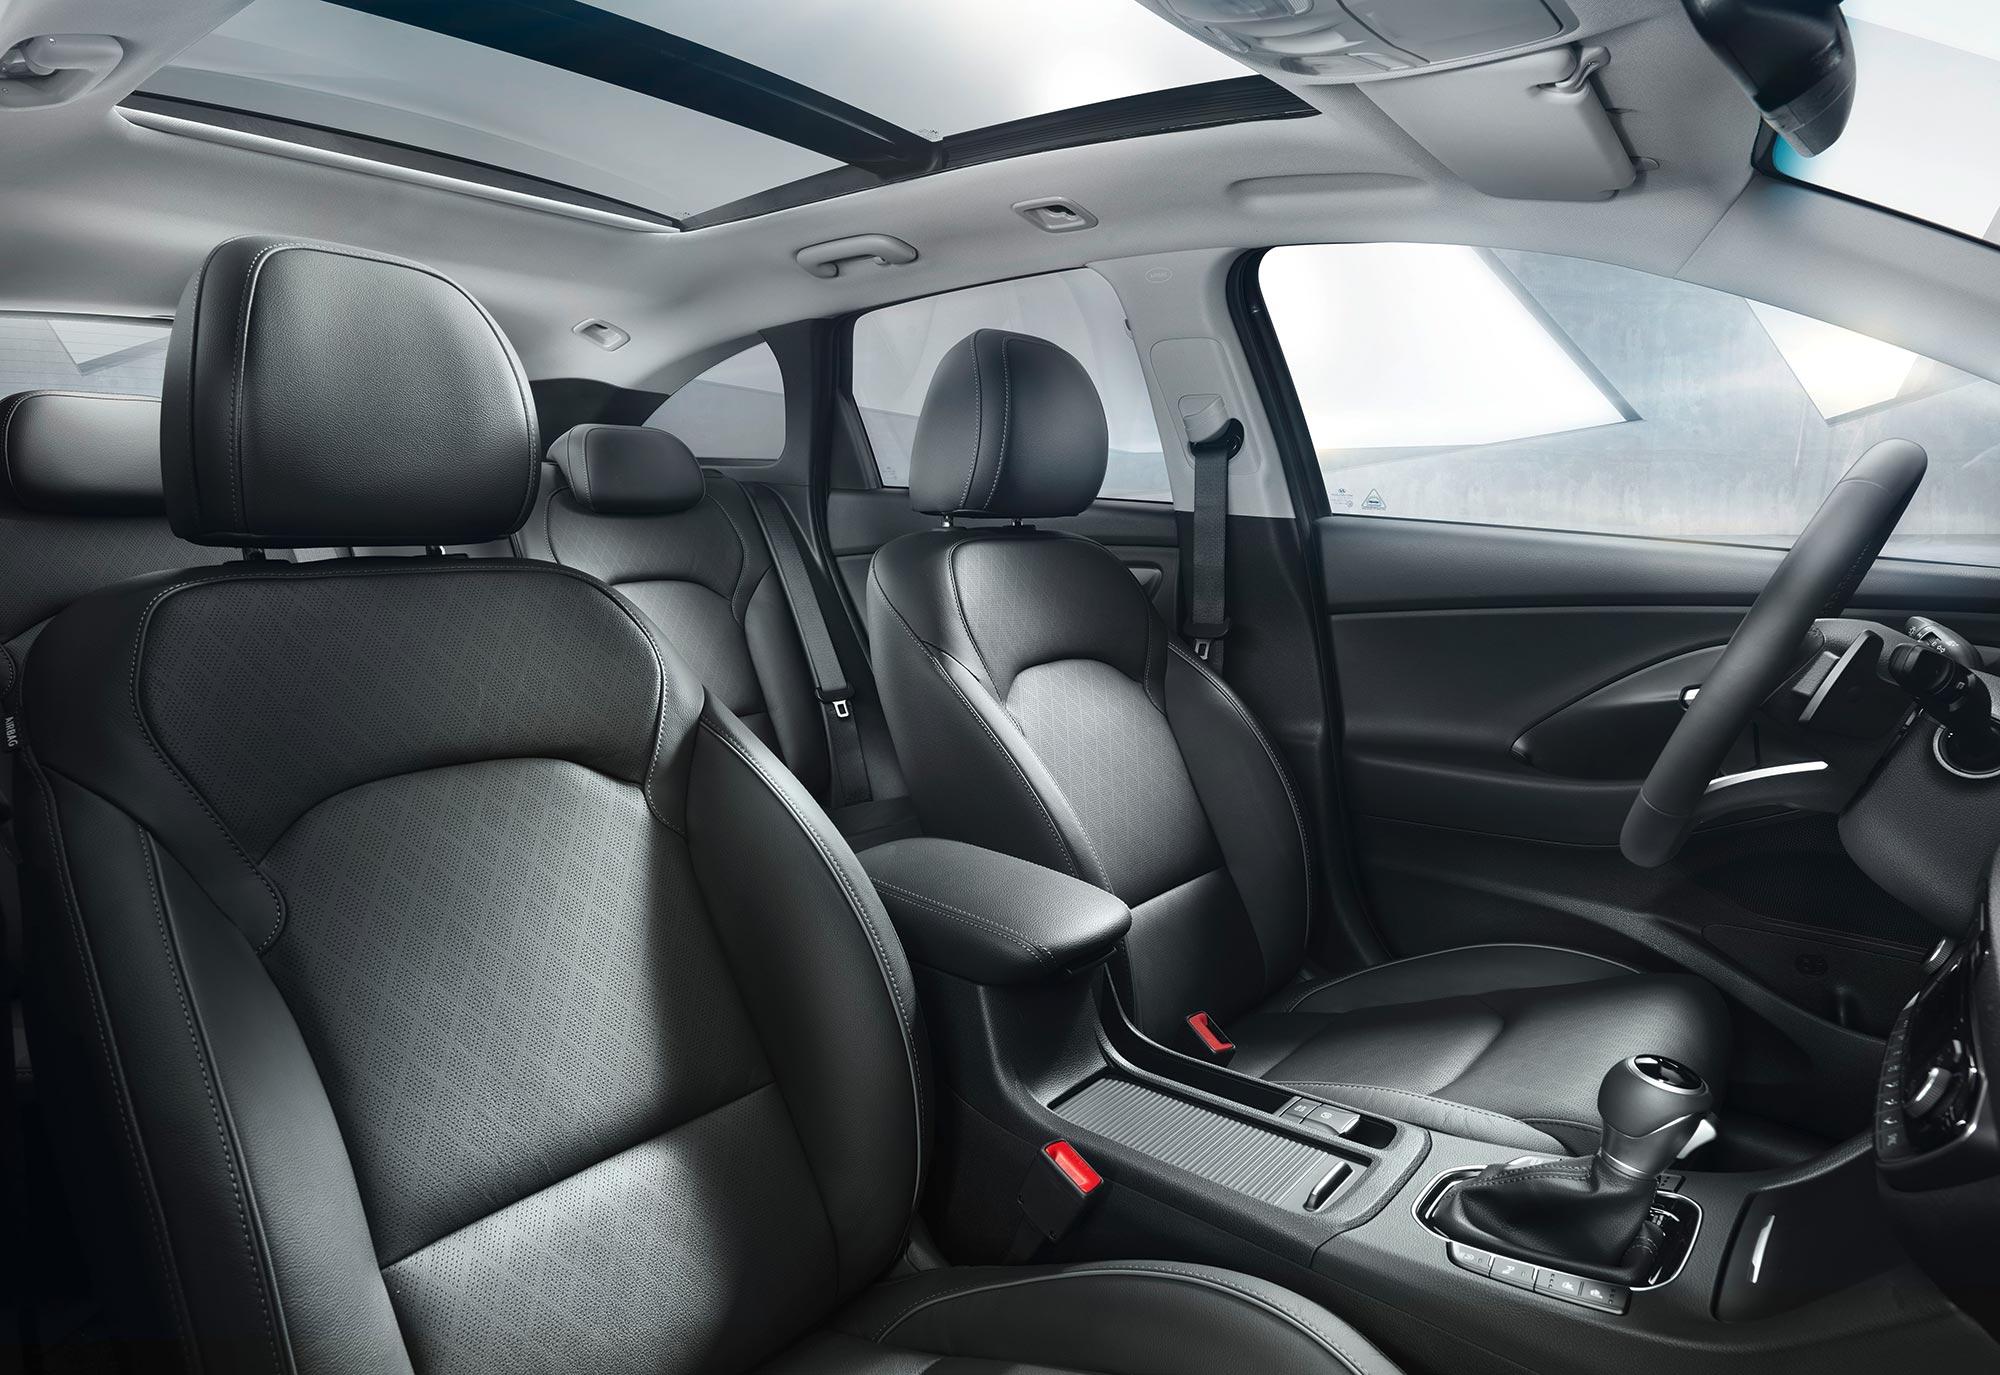 i30-wagon-interior-(1).jpg